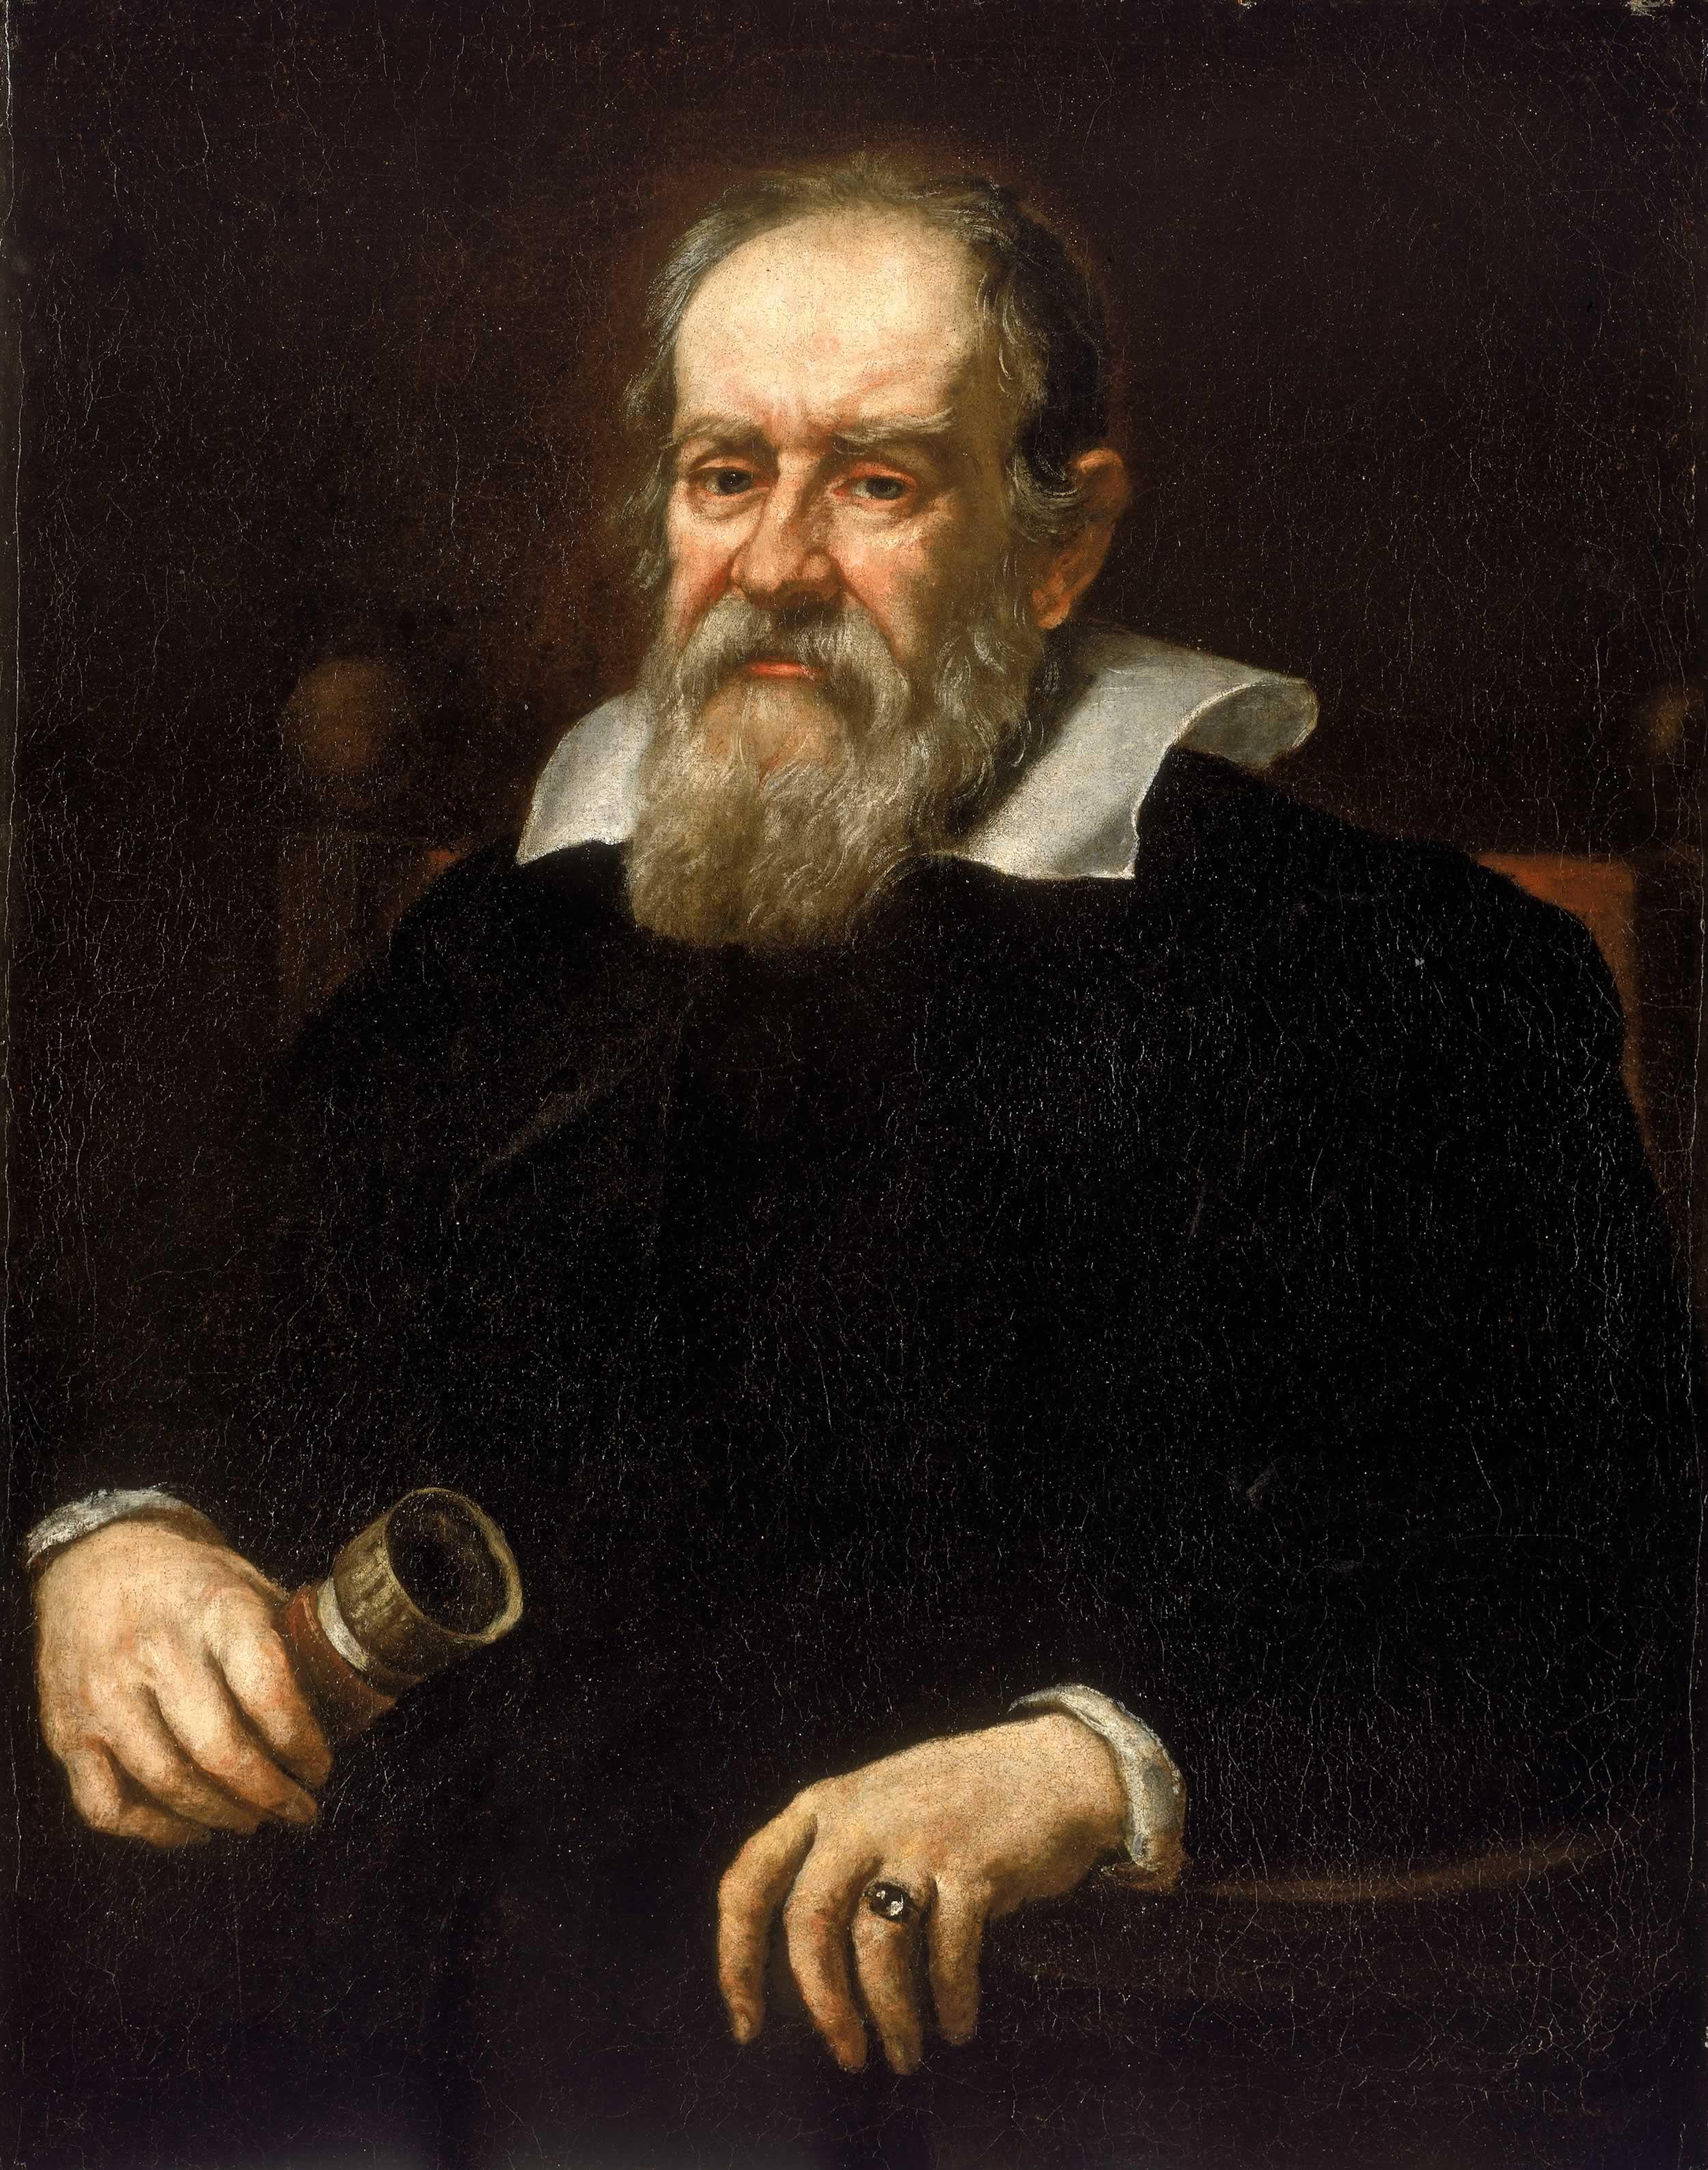 "<img src=""galileo.jpg"" alt=""A portrait of Galileo Galilei by Justus Sustermans"">"